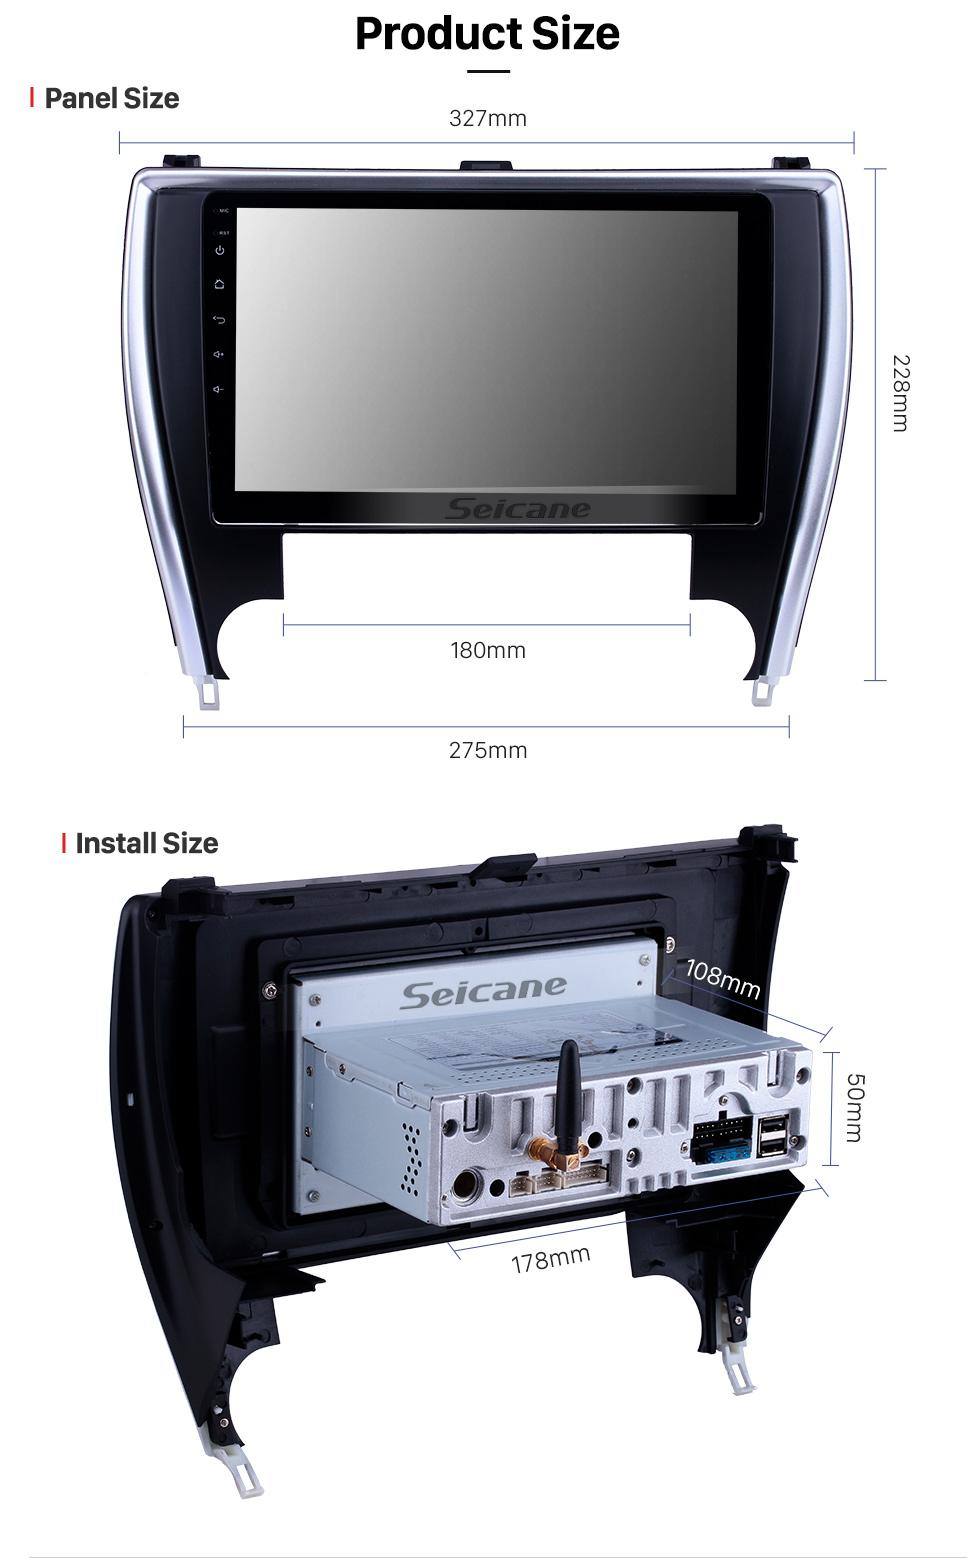 Seicane 10,1 Zoll Android 9.0 GPS-Navigationsradio für 2015 Toyota Camry (Amerika-Version) Bluetooth HD Touchscreen Carplay-Unterstützung Rückfahrkamera